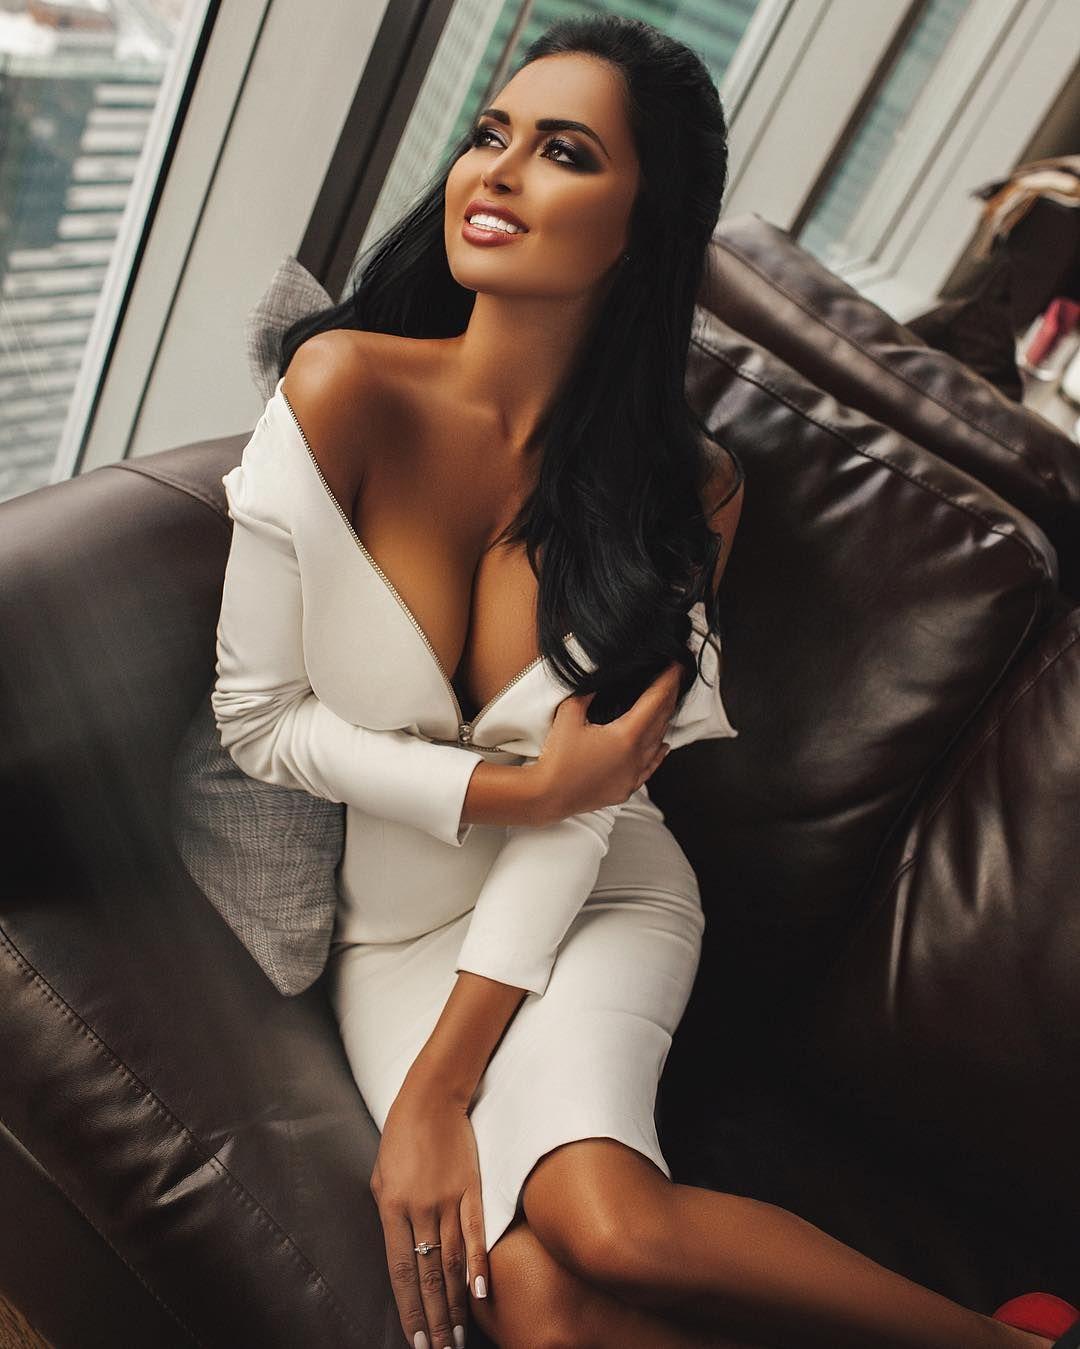 Porno Nita Kuzmina nude (91 photo), Ass, Sideboobs, Instagram, panties 2020